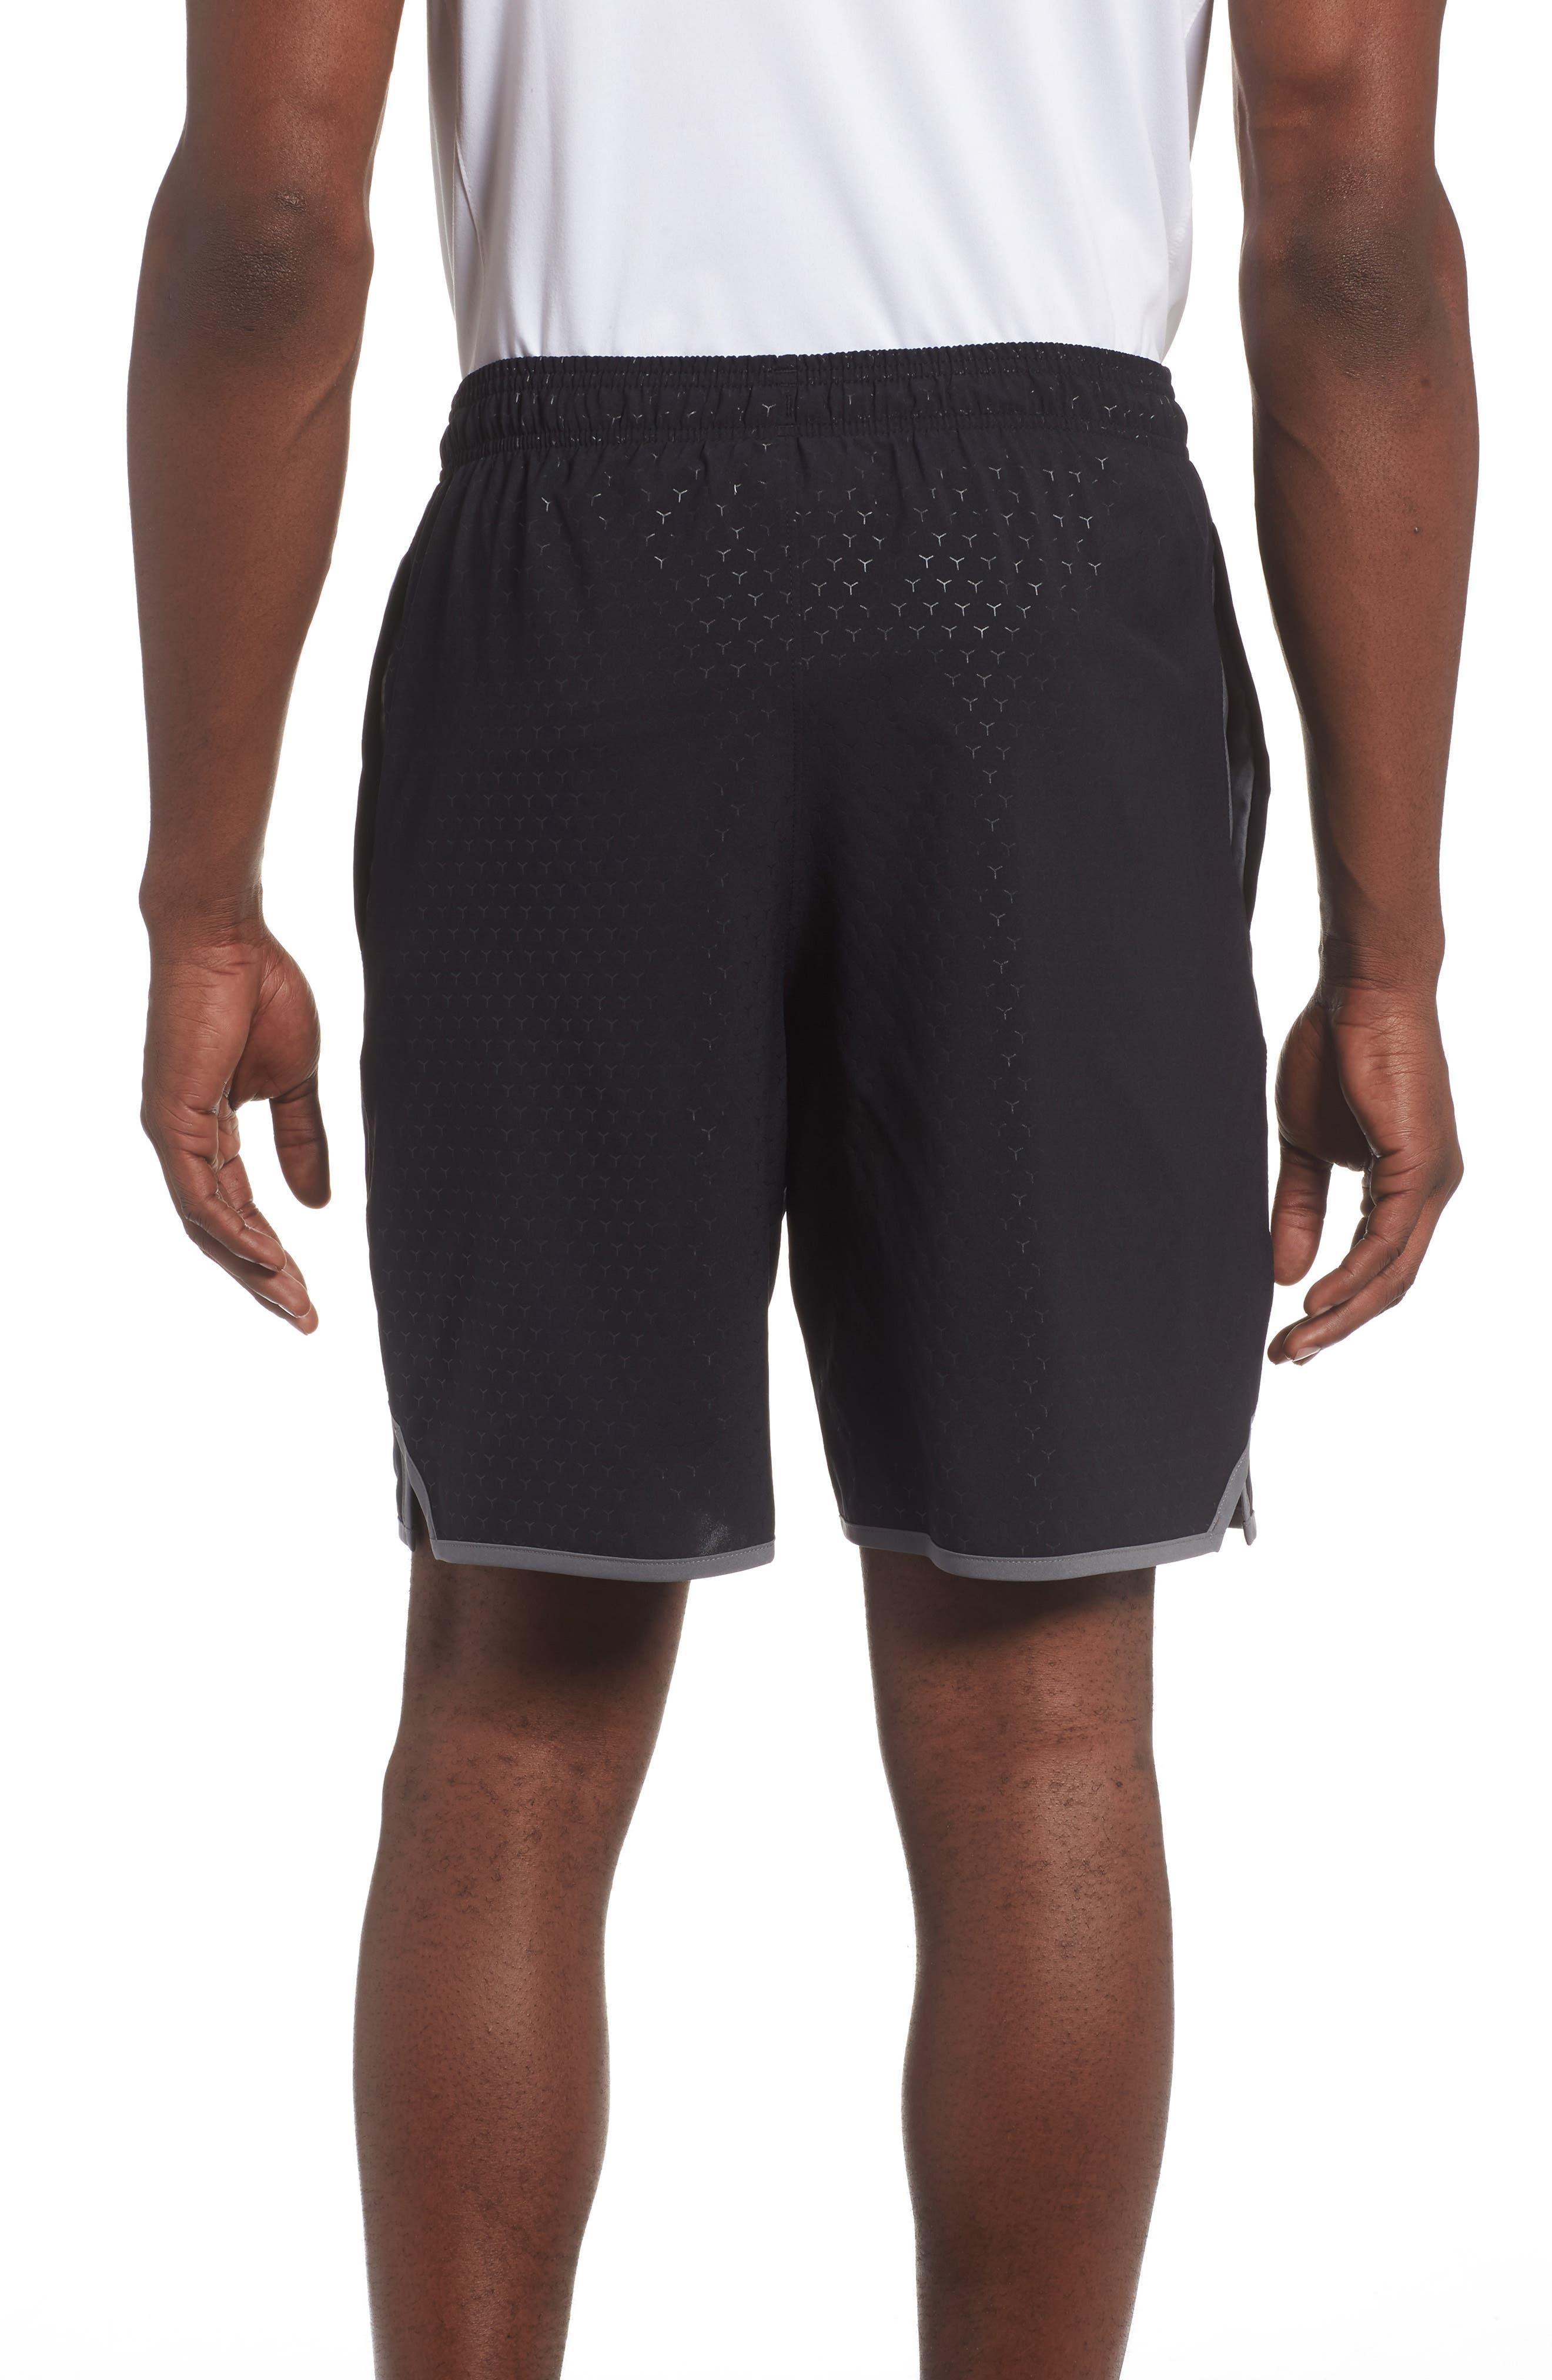 Qualifier Training Shorts,                             Alternate thumbnail 4, color,